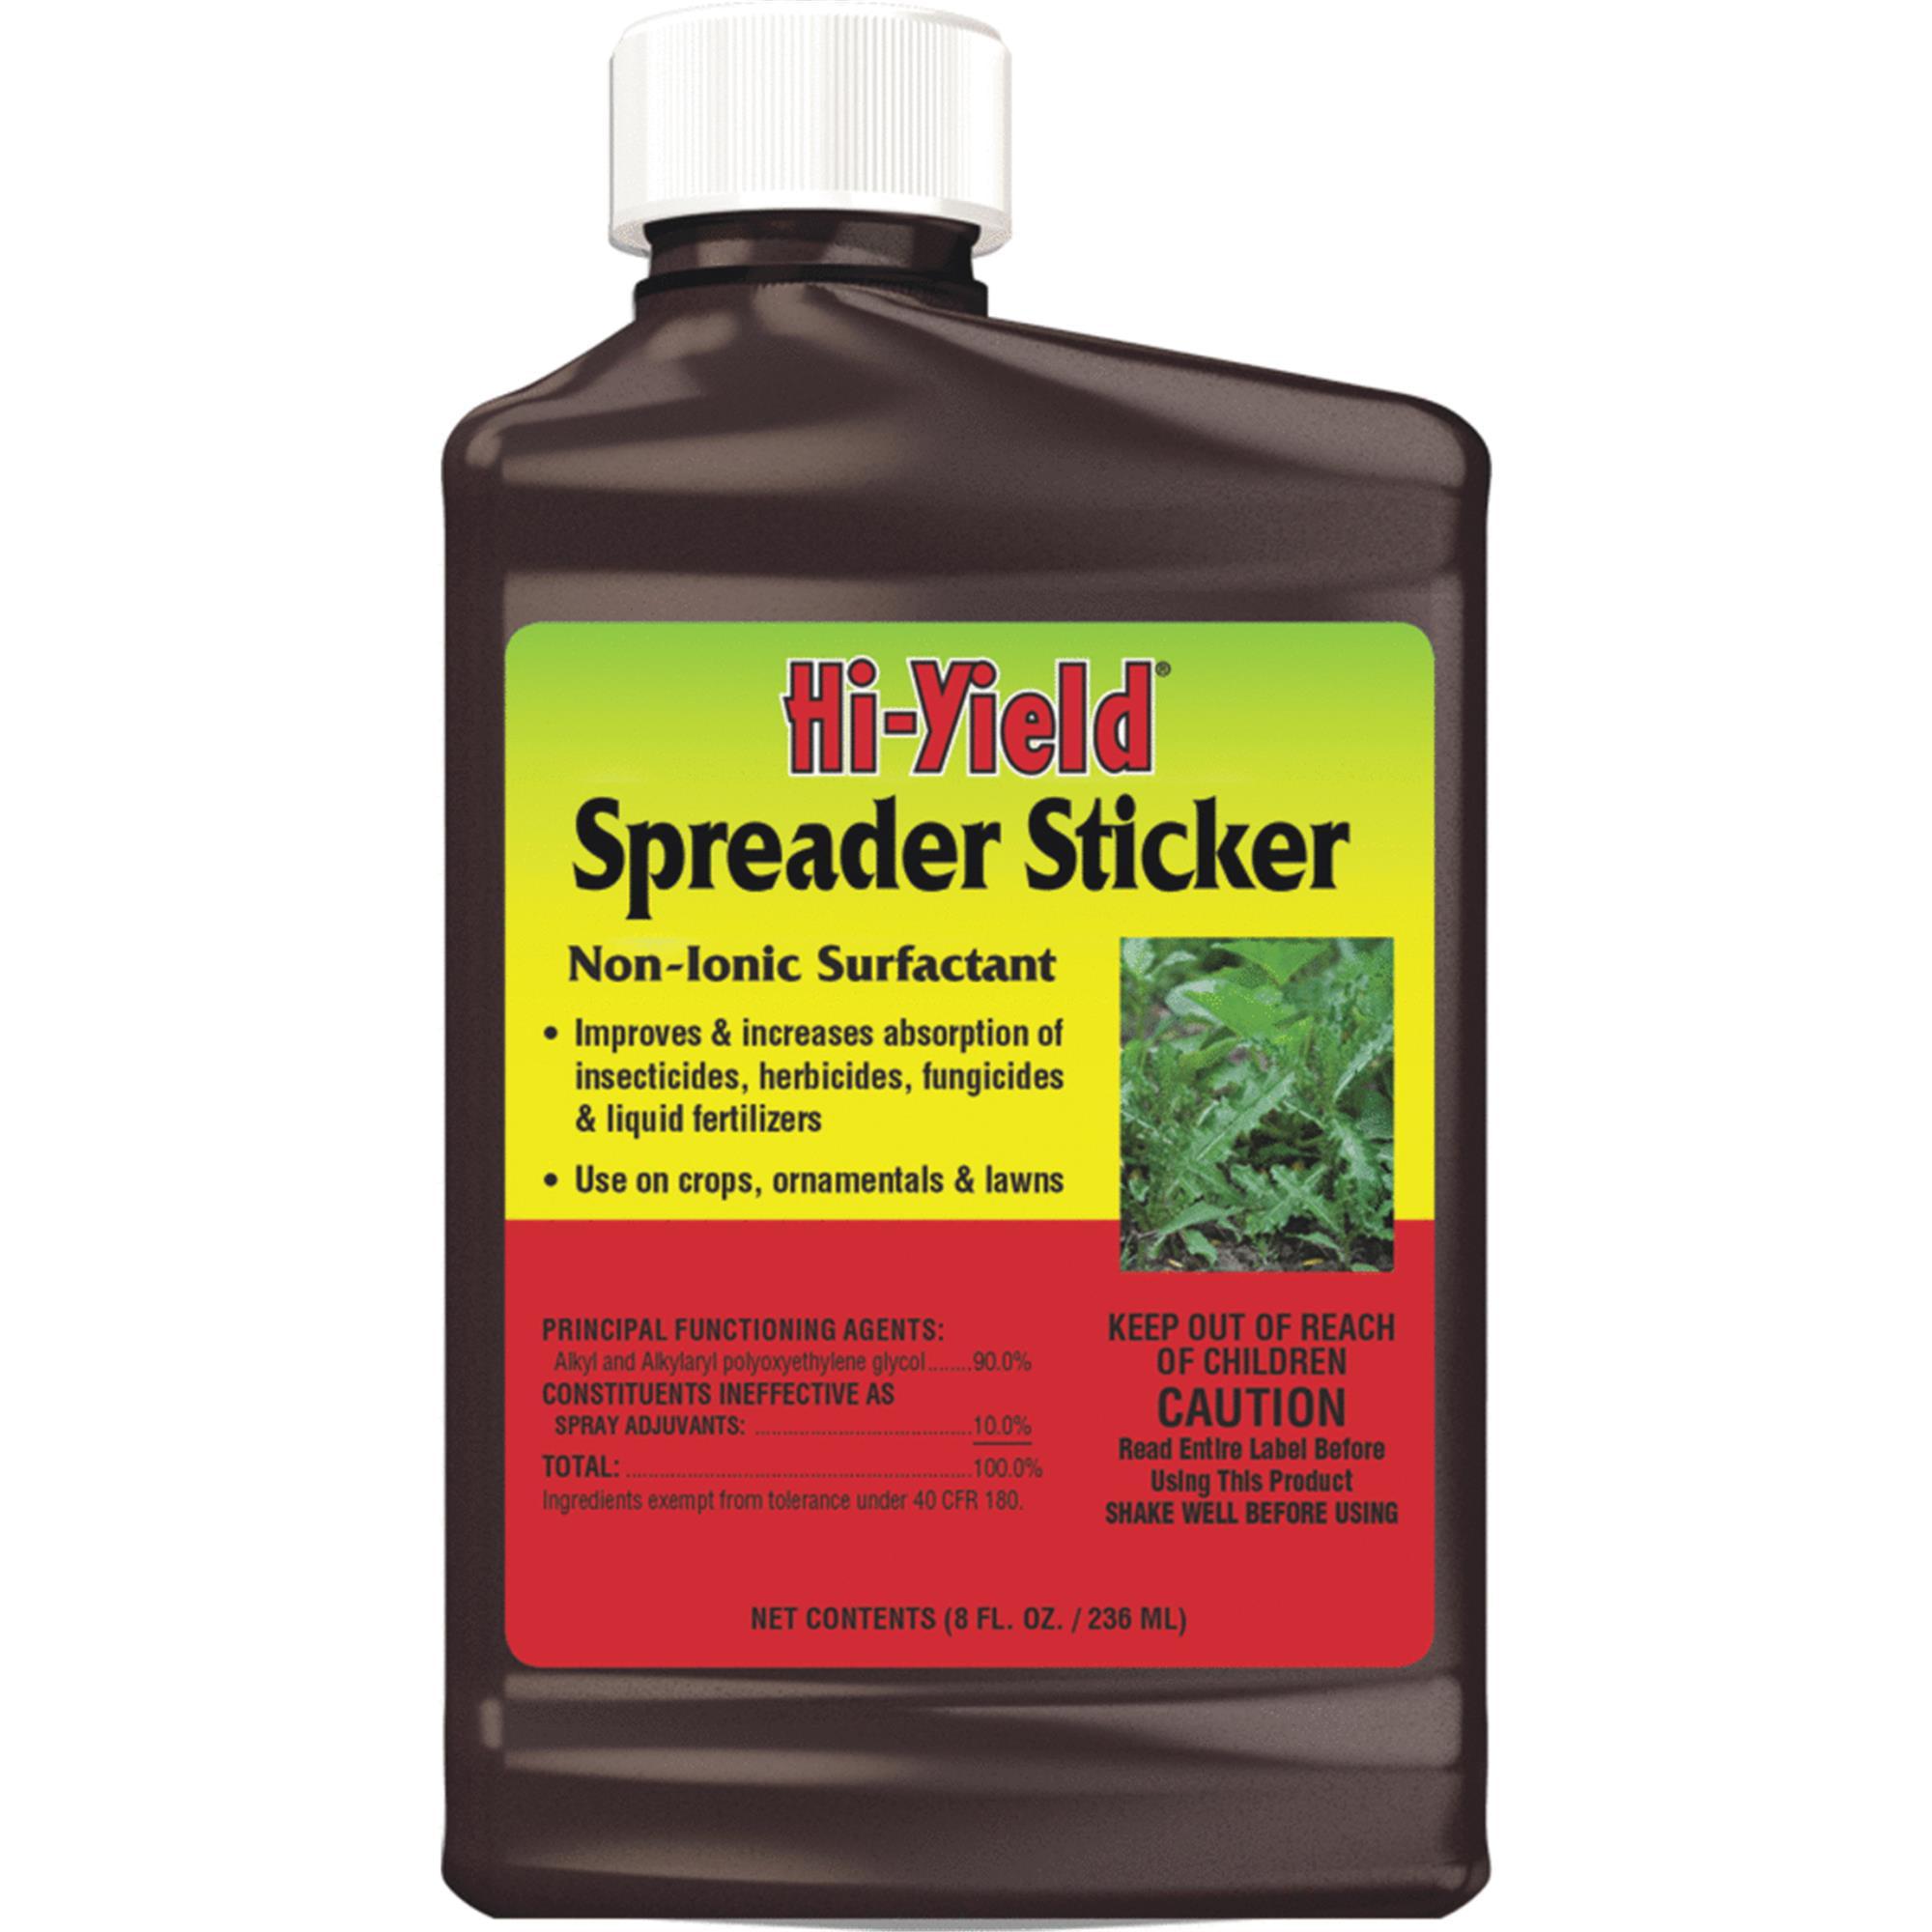 Hi-Yield Spreader Sticker